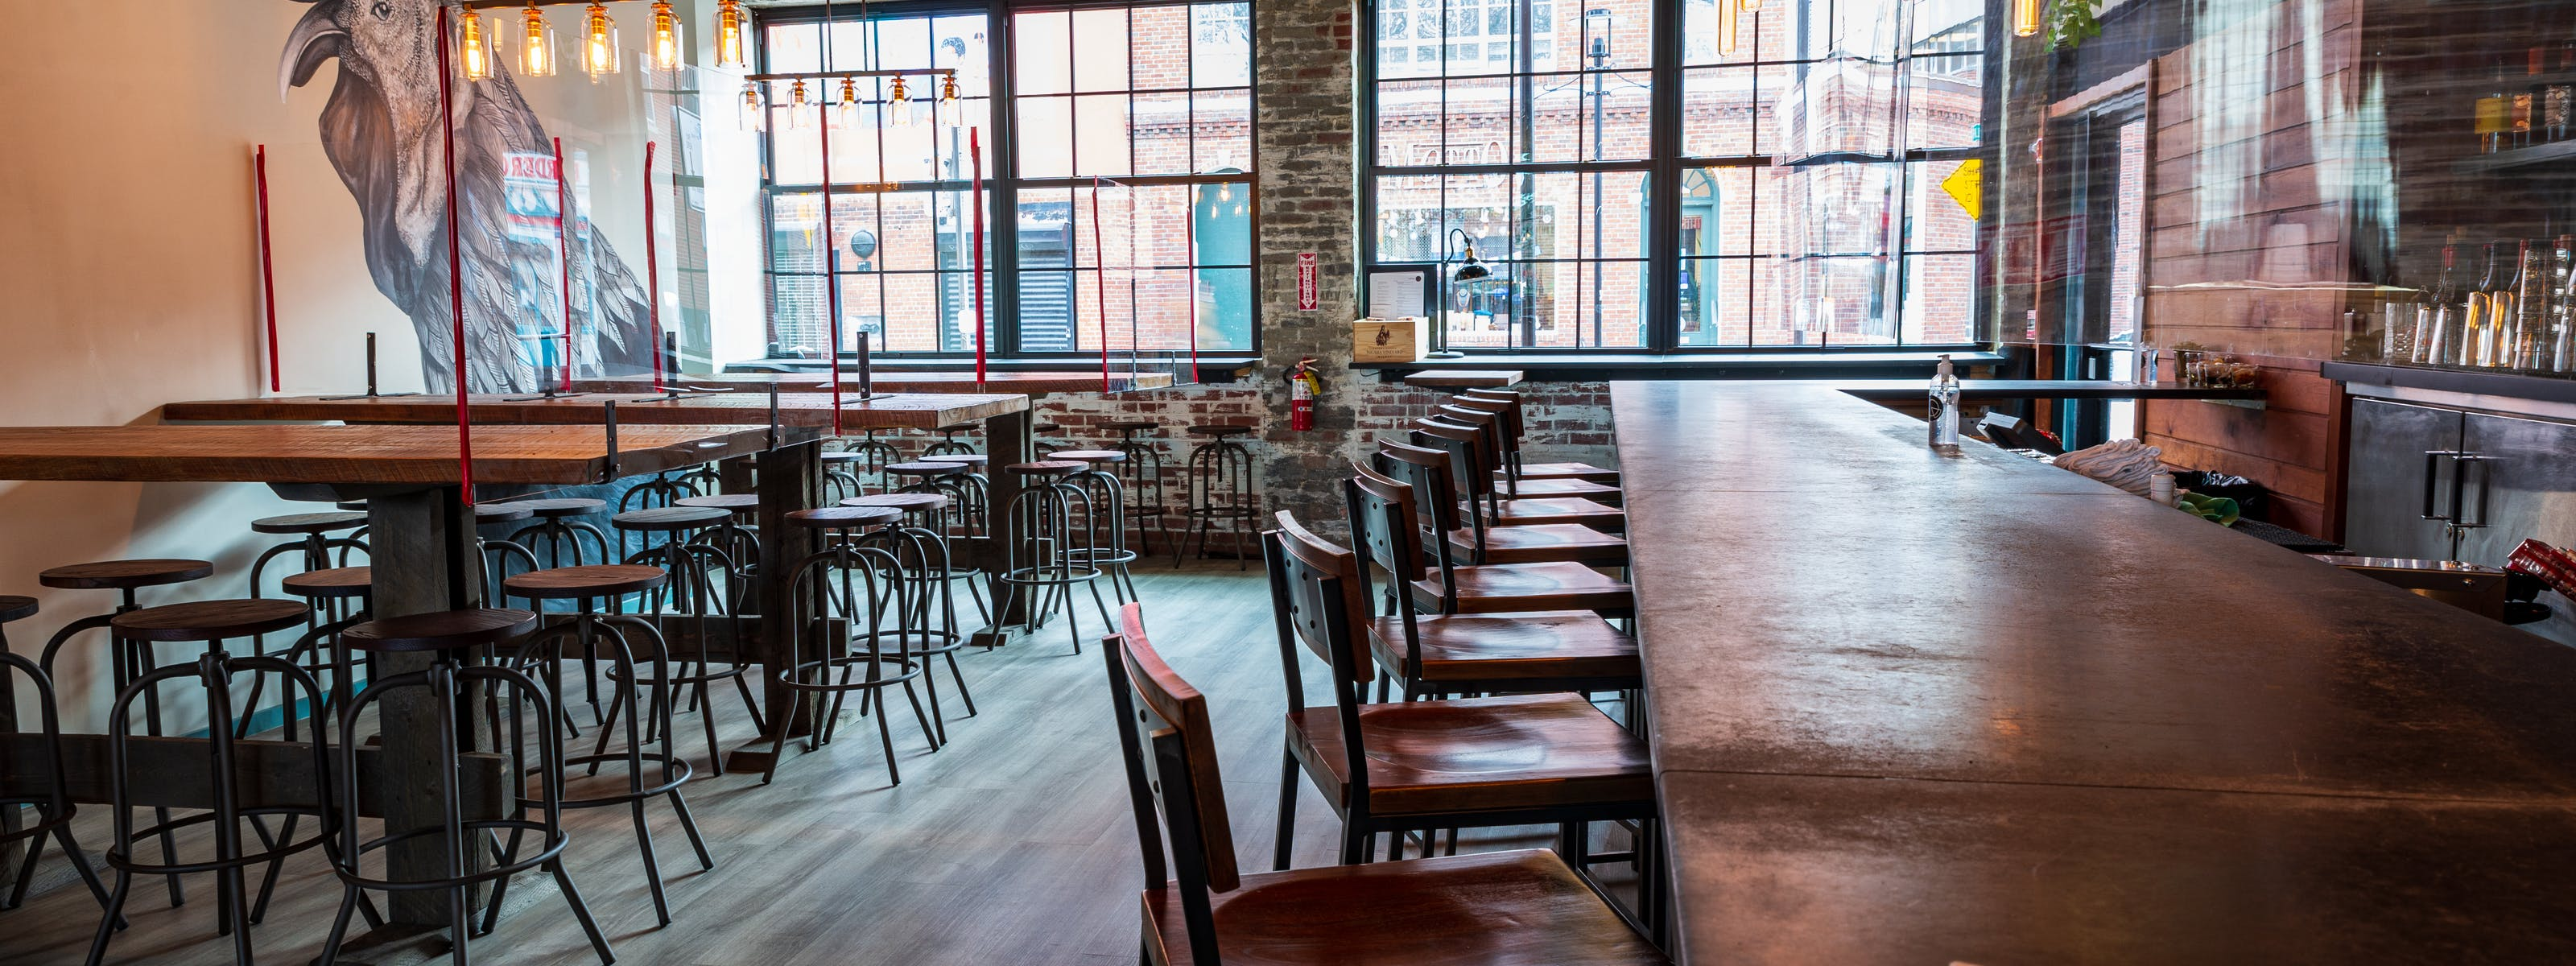 Boston's New Restaurant Openings - Boston - The Infatuation